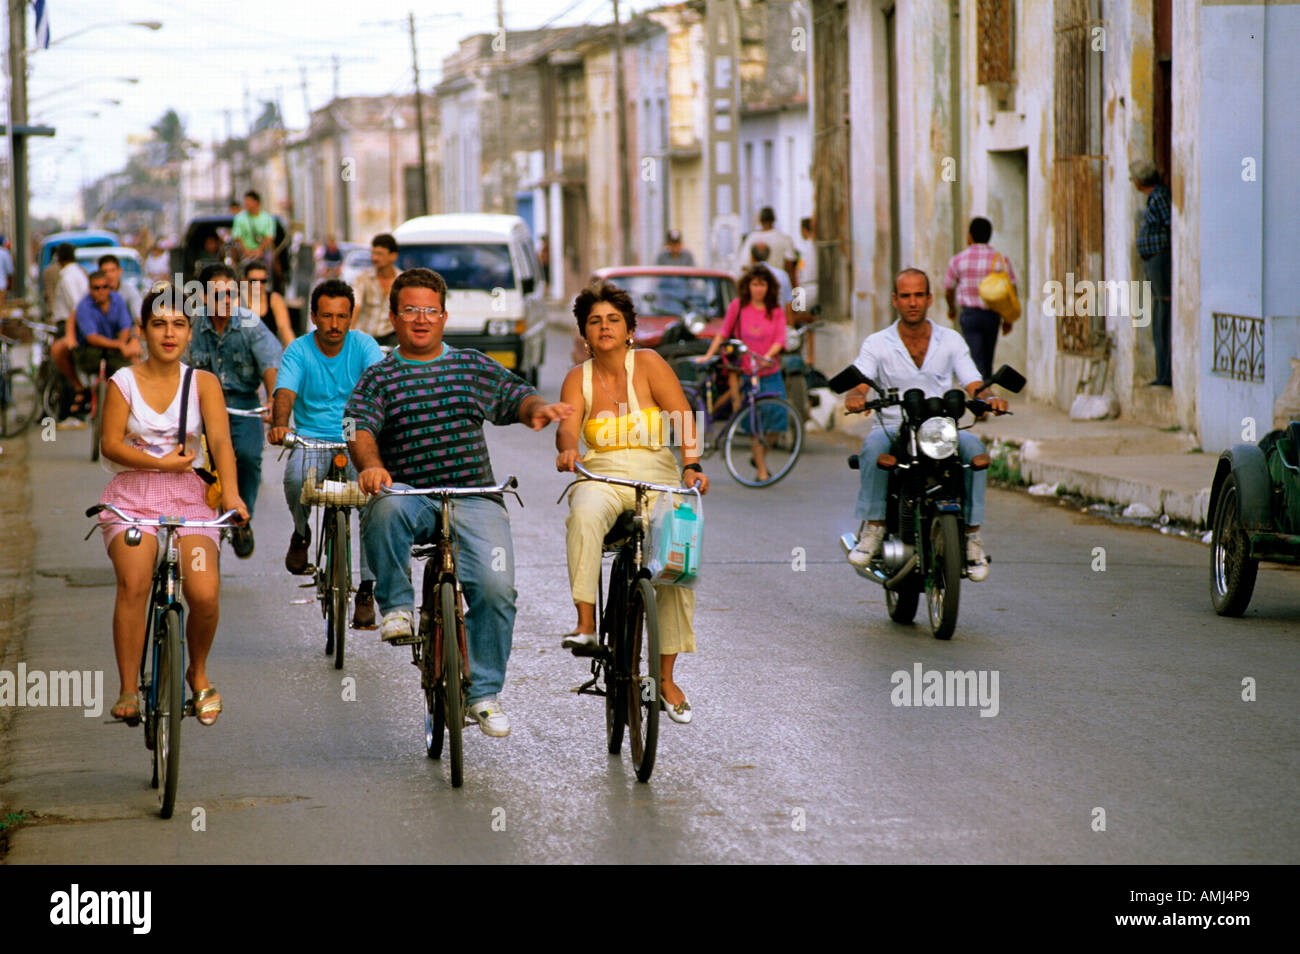 Kuba, Matanzas, Cardenas, Strassenszene Stock Photo